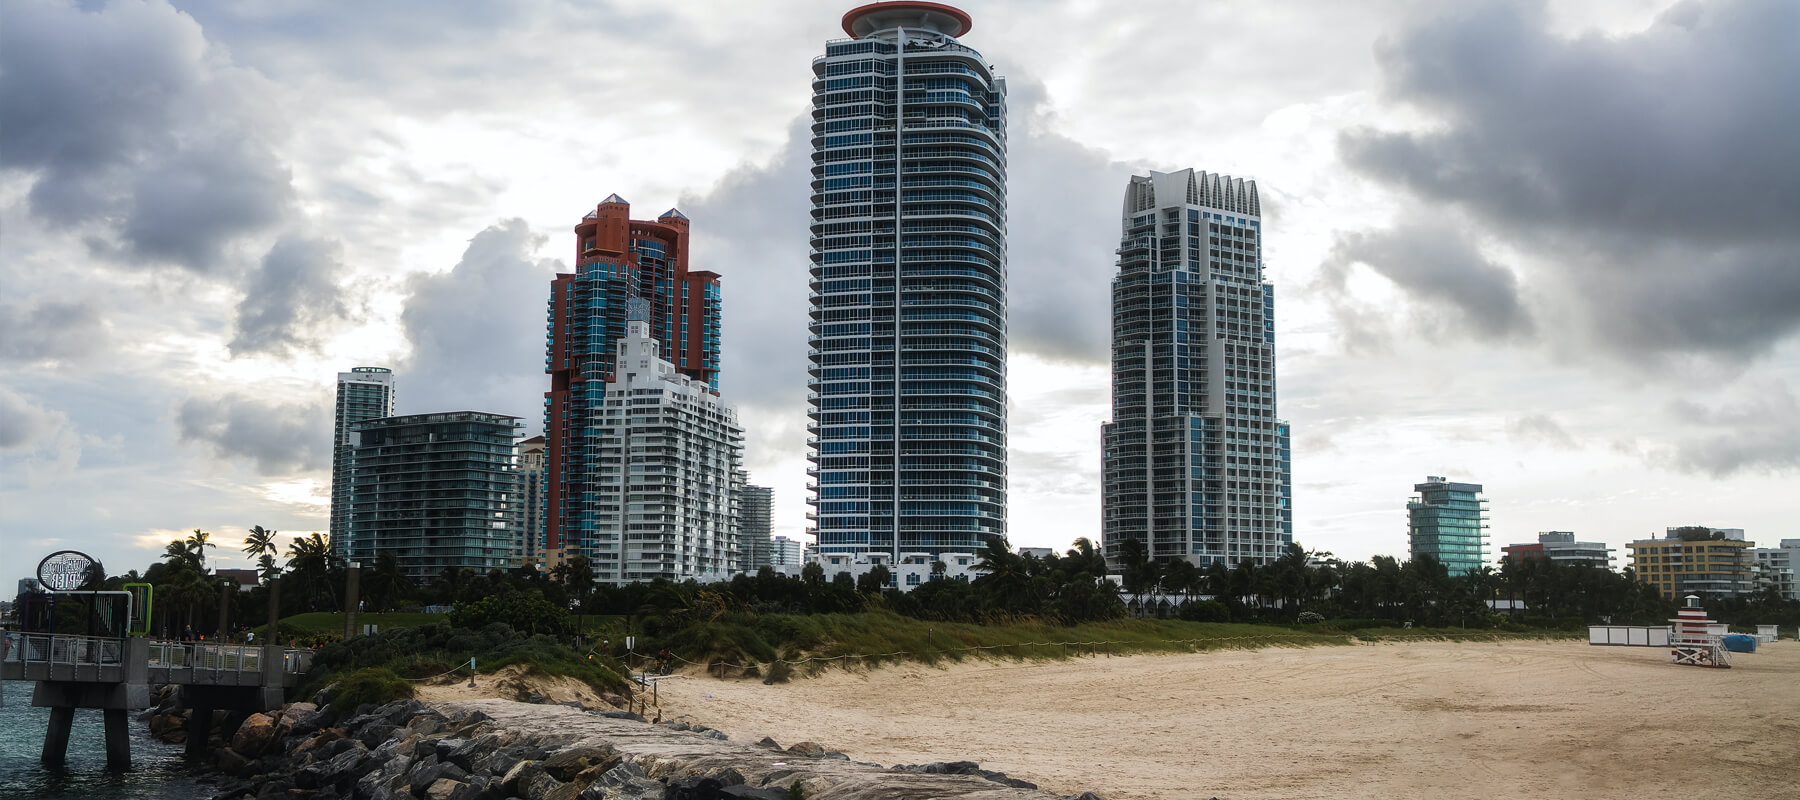 Kitchenaid Appliance Repair Service Miami Beach | KitchenAid Appliance Repair Professionals